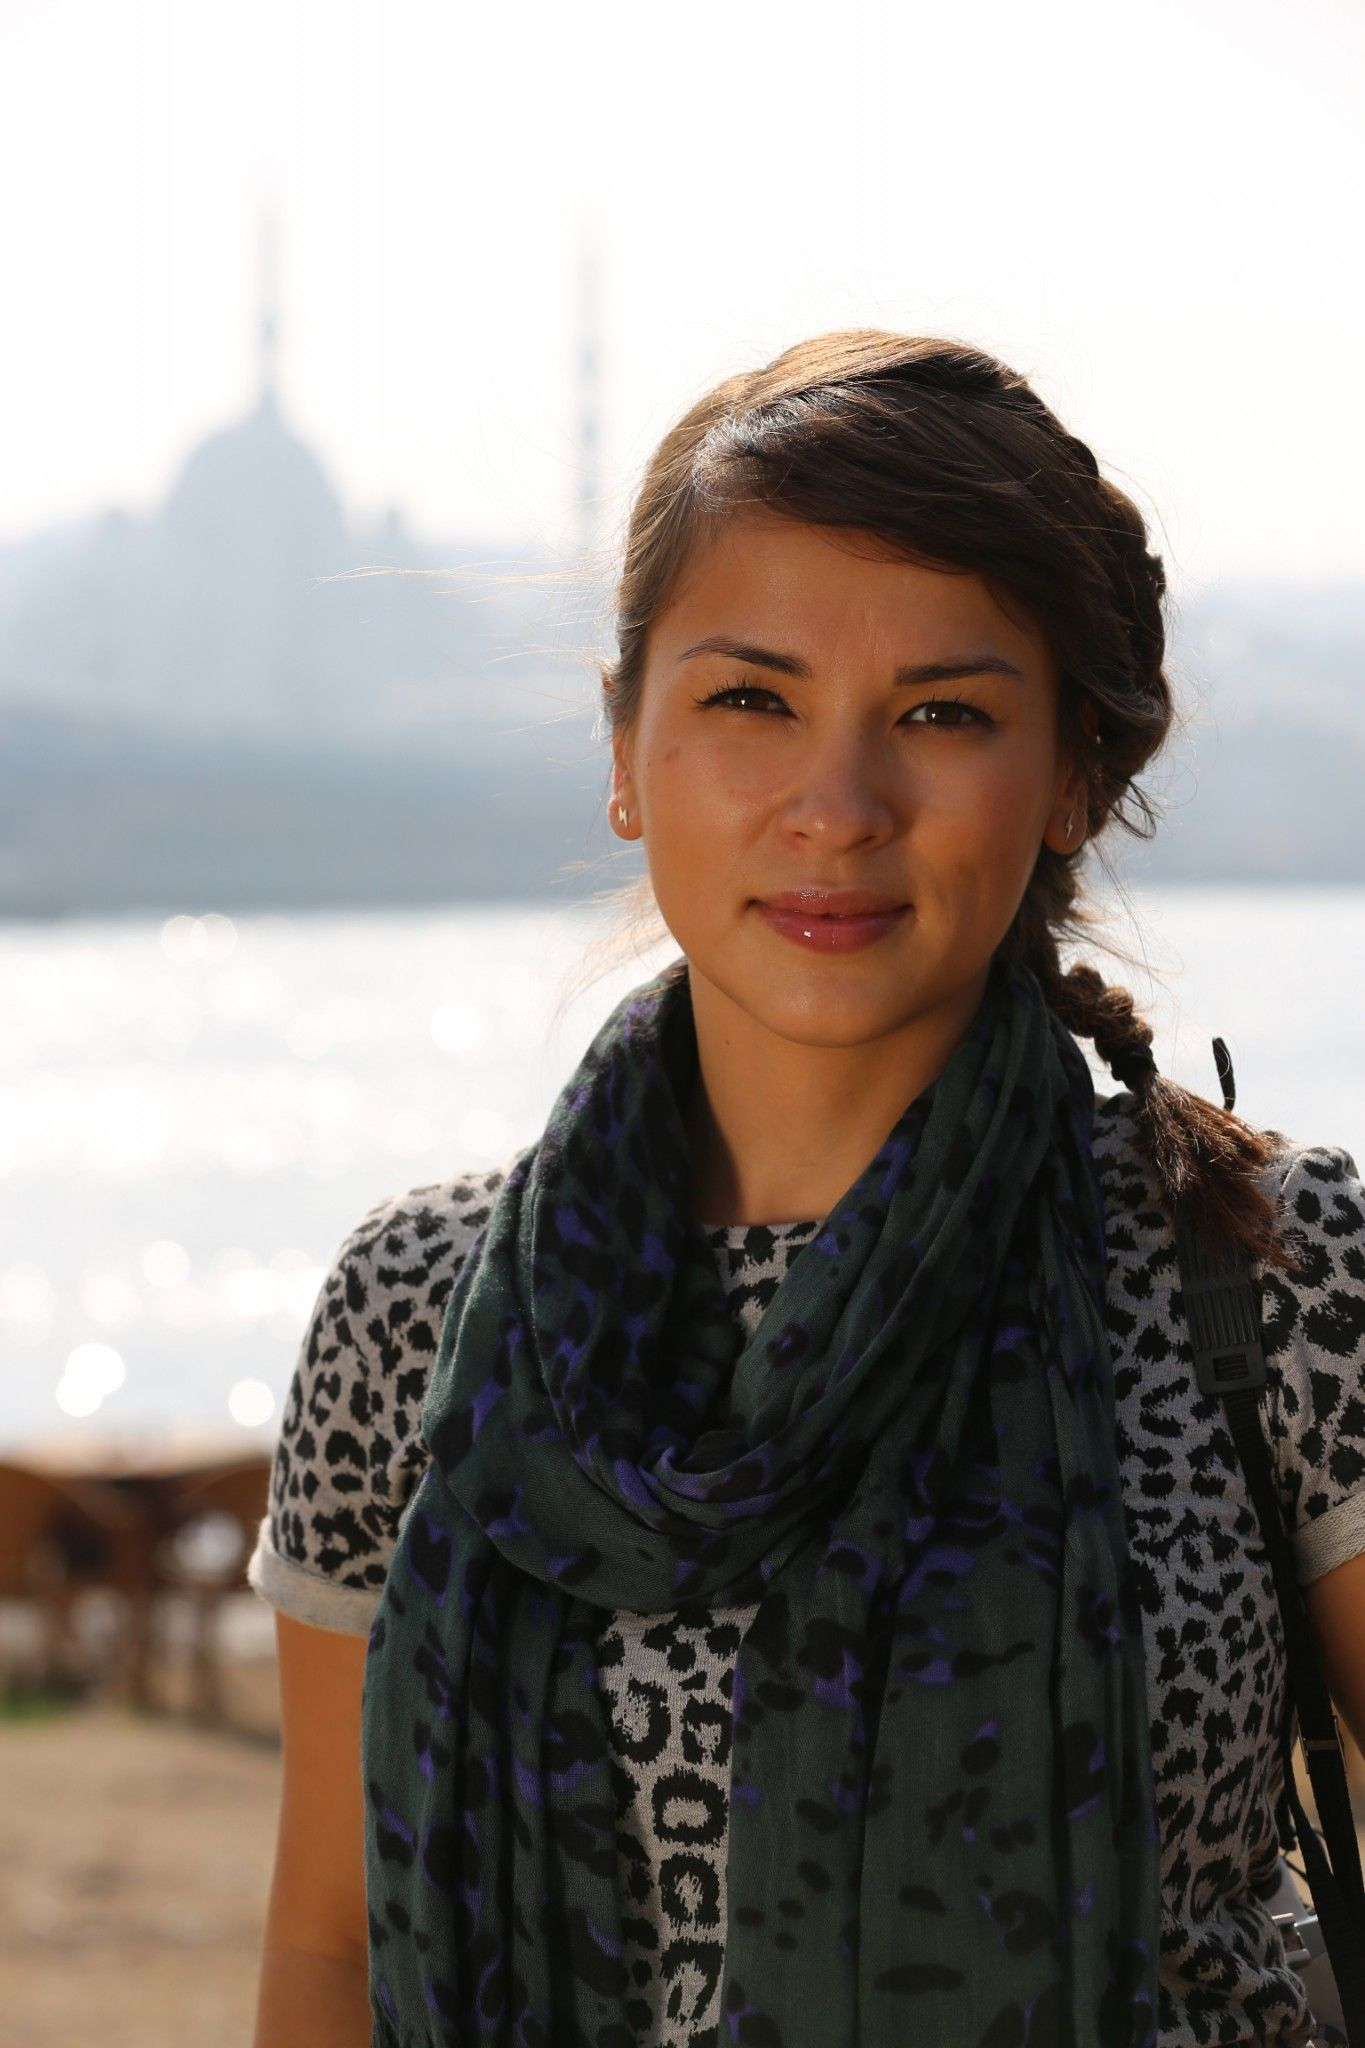 istanbul 1 | RACHEL KHOO - Food meets Fashion | Pinterest | Rachel ...